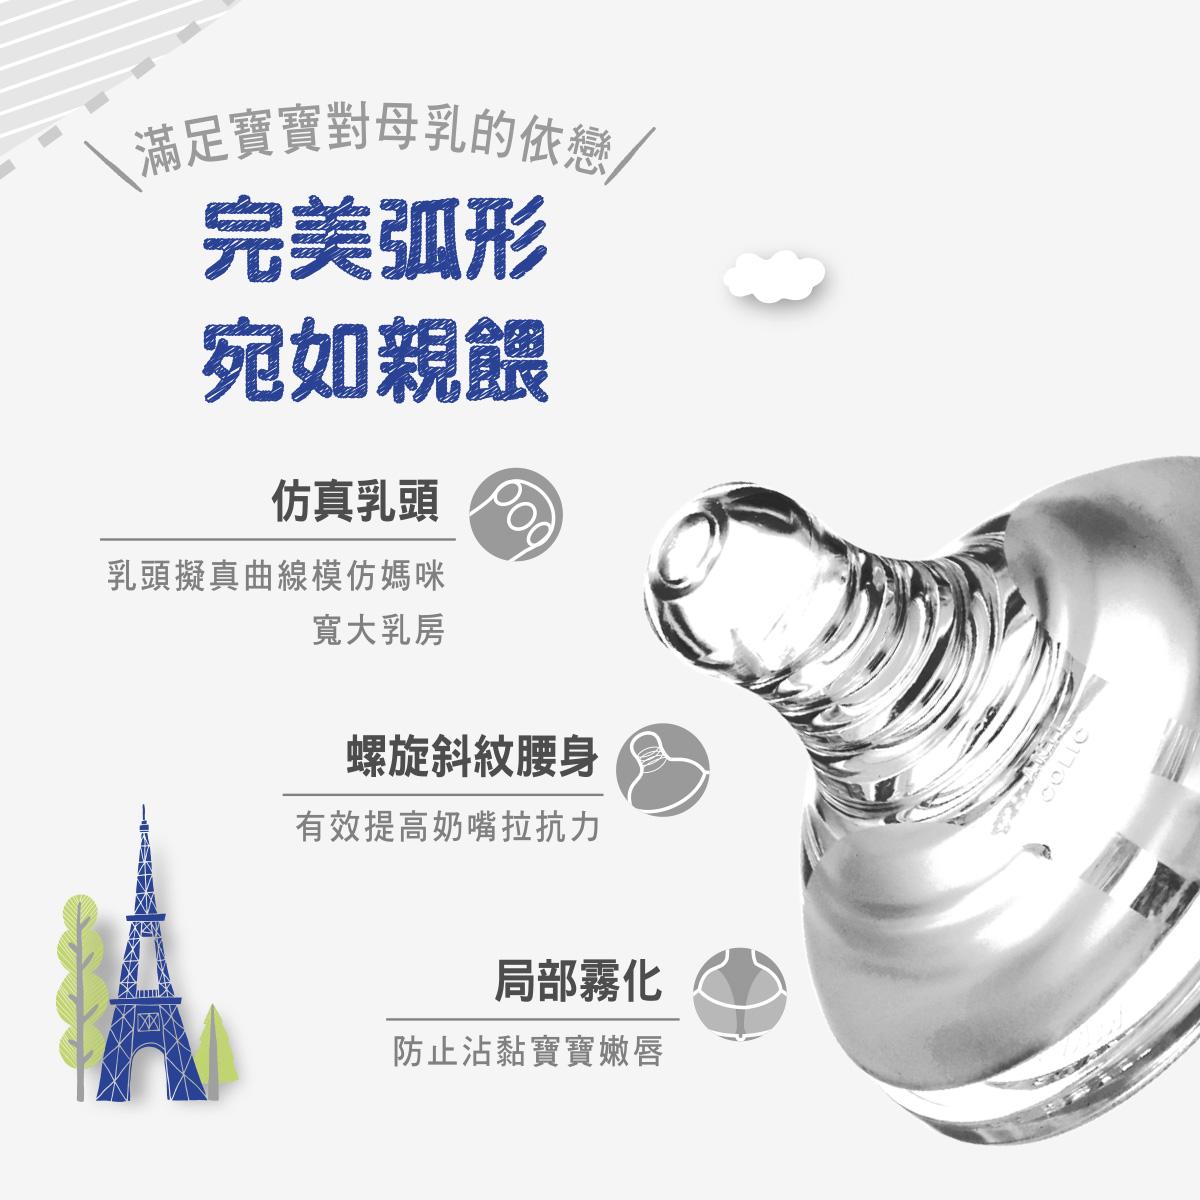 proimages/bottles/PPSU/5875/5875-品味巴黎PPSU奶瓶-EDM-9.jpg